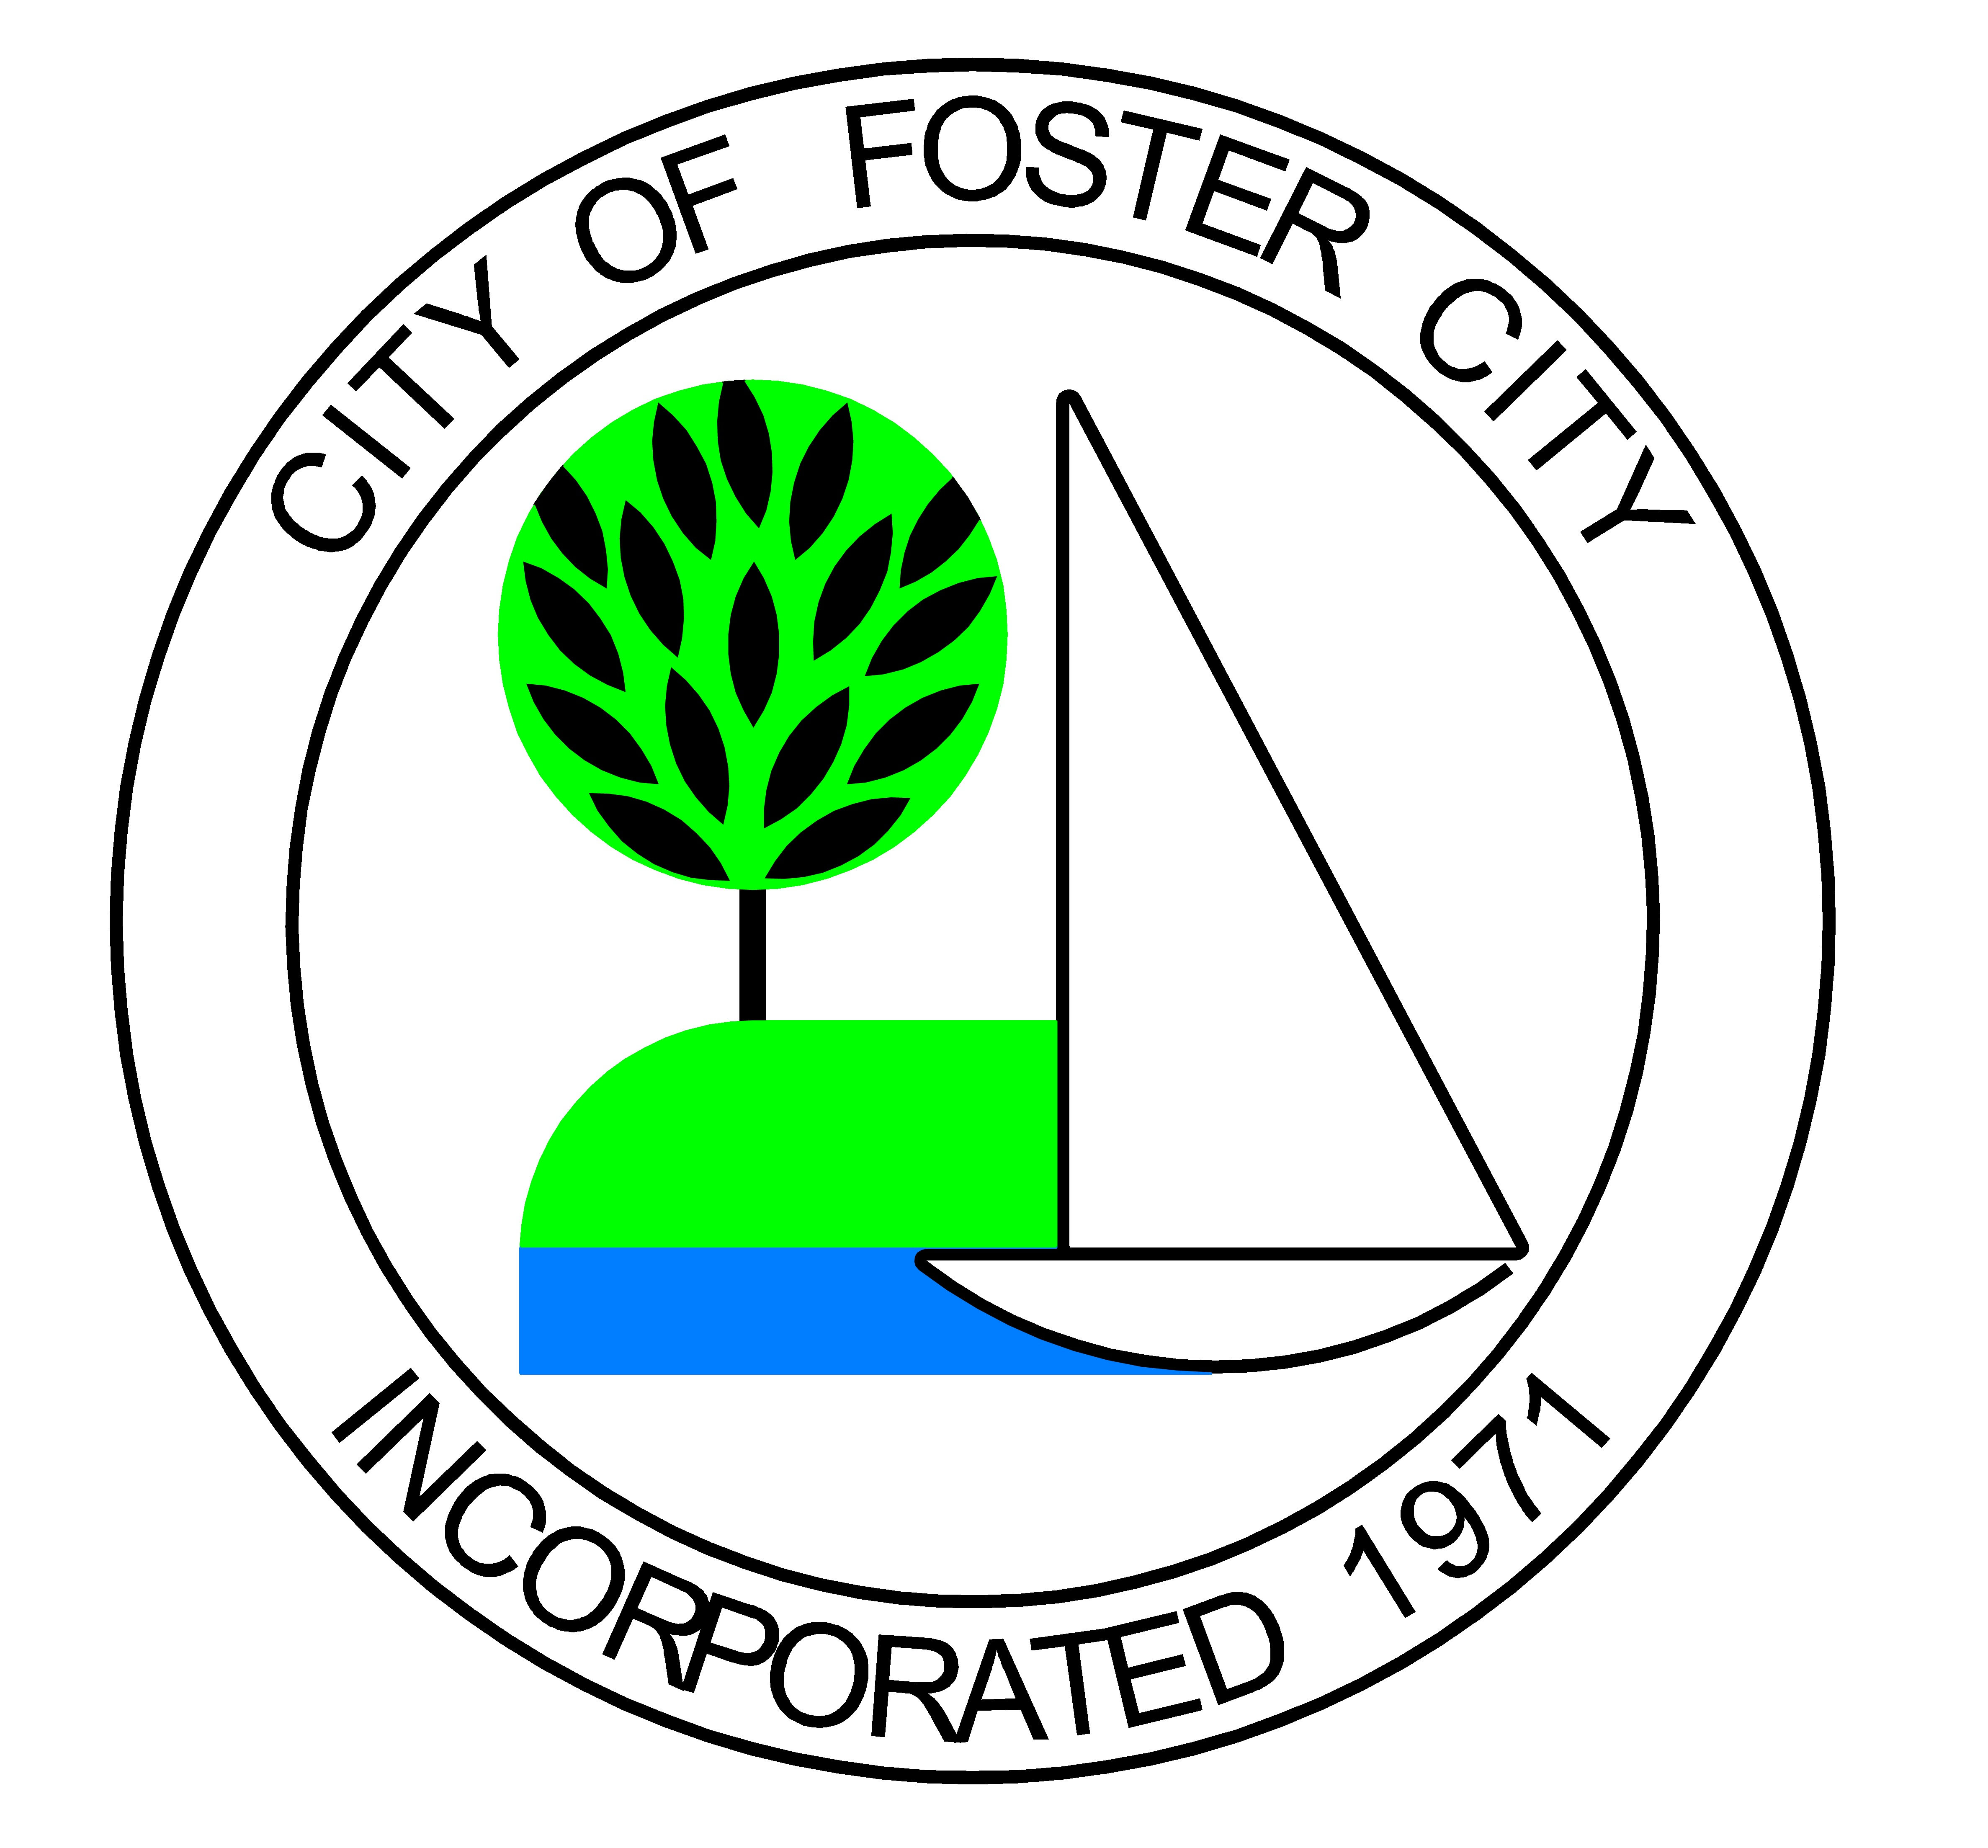 City of Foster City logo